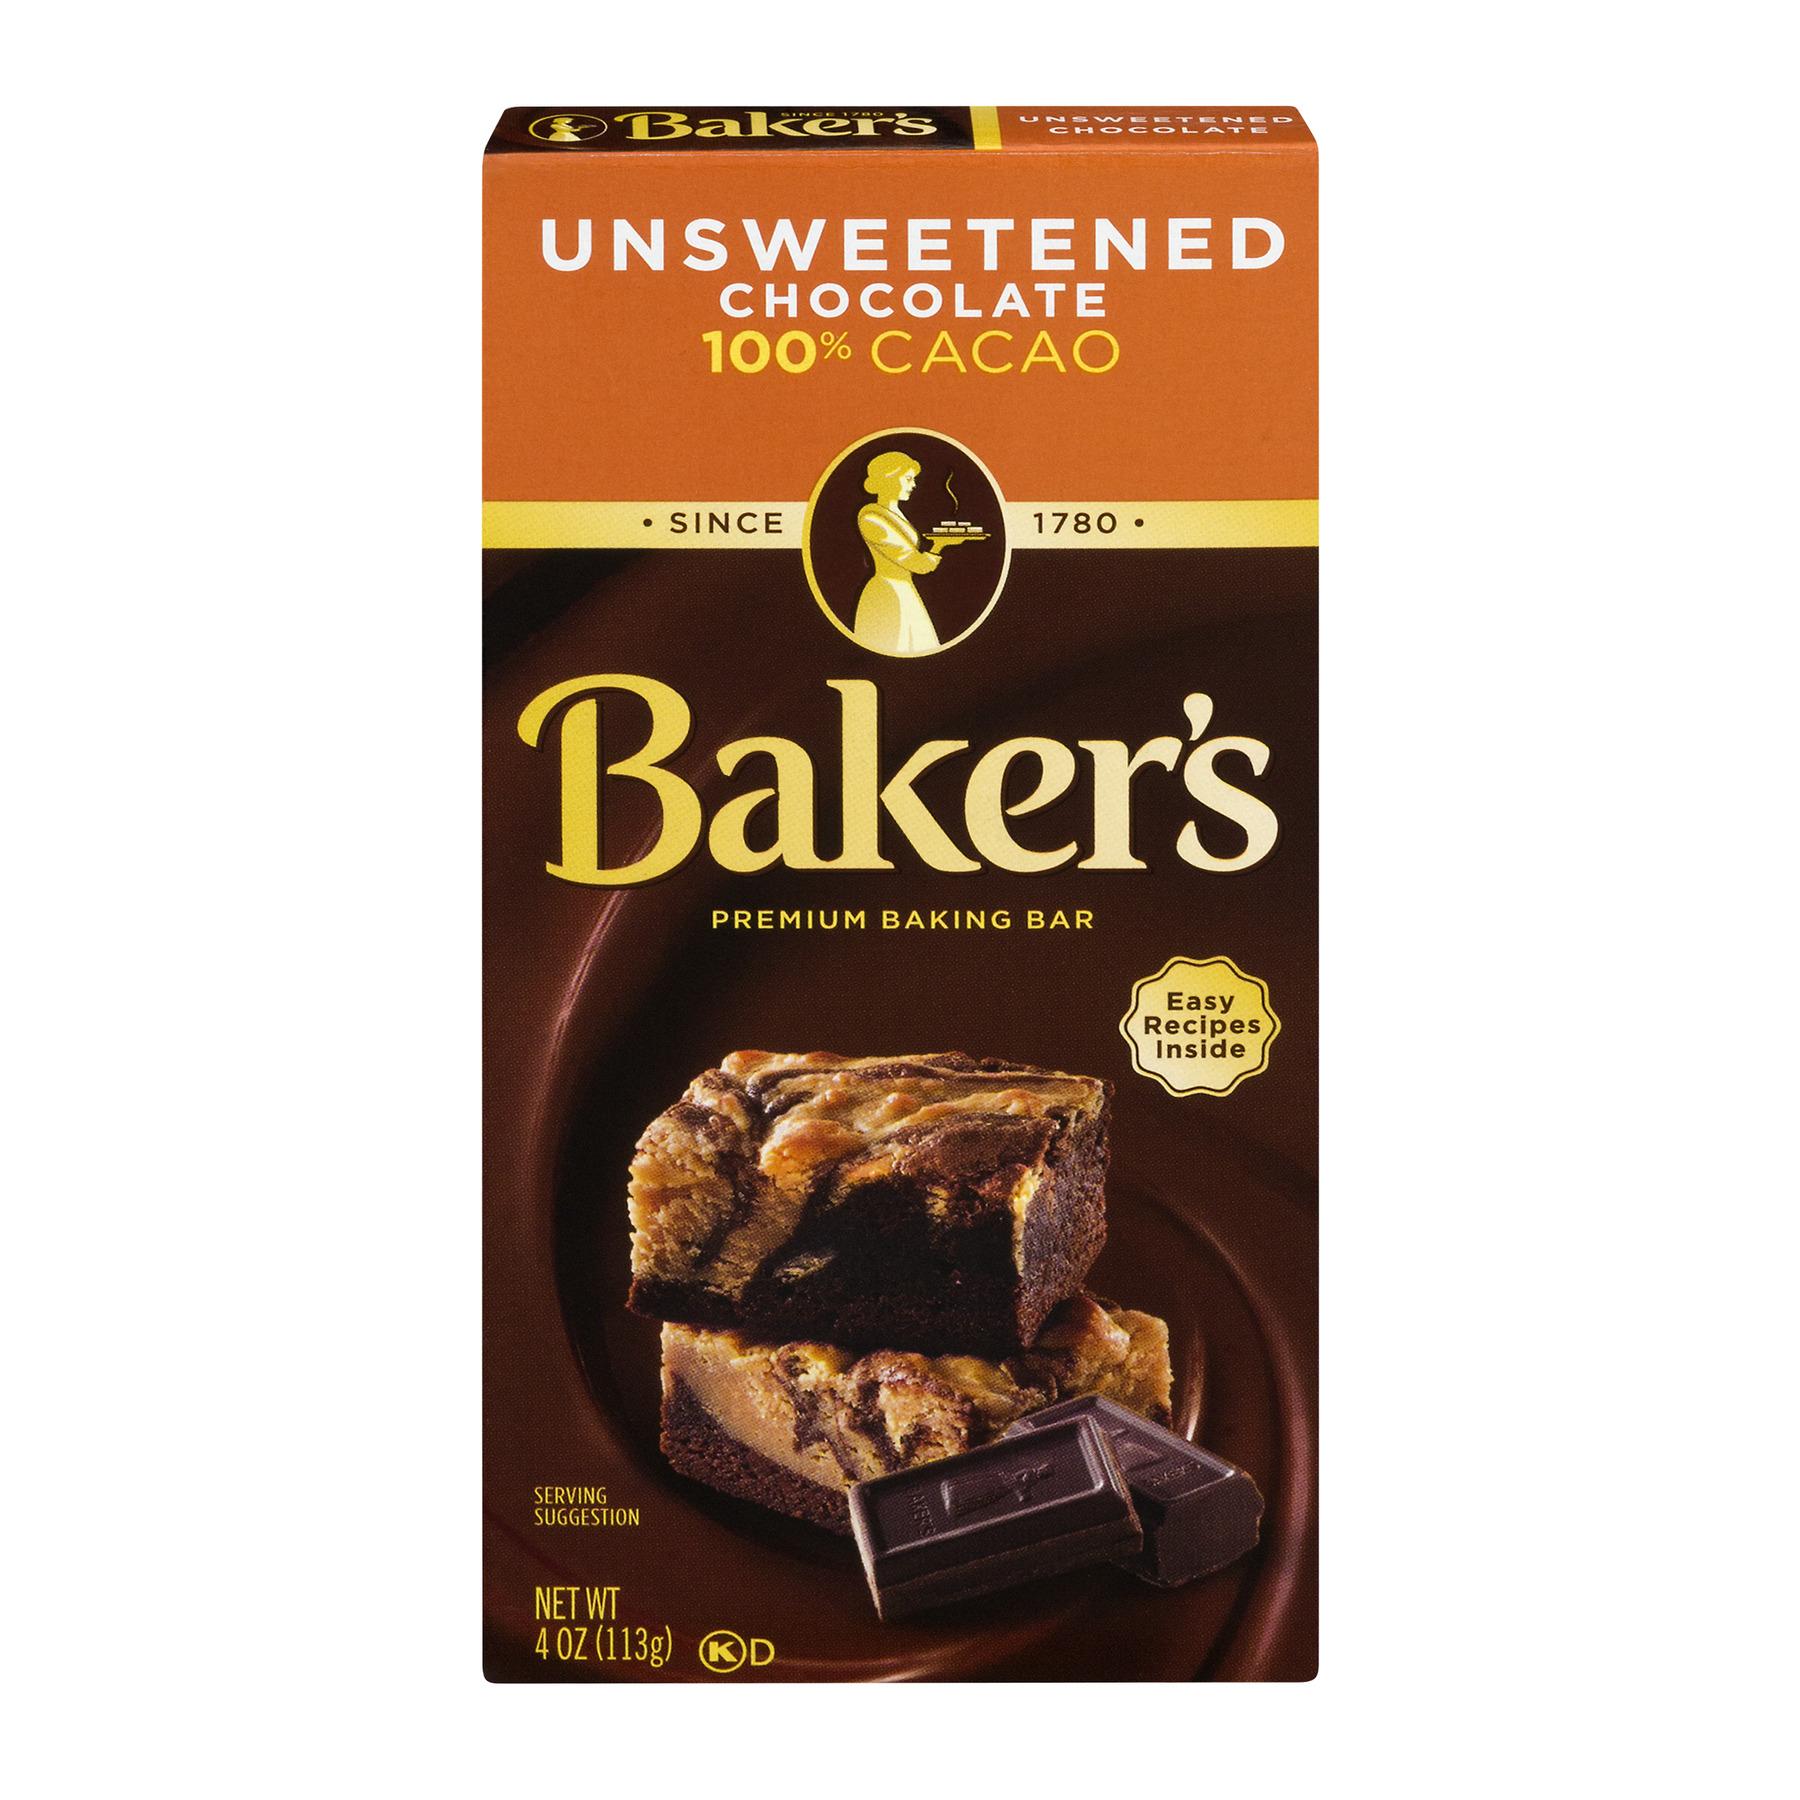 Baker's Baking Chocolate Bar 100% Cacao Unsweetened, 4 Oz